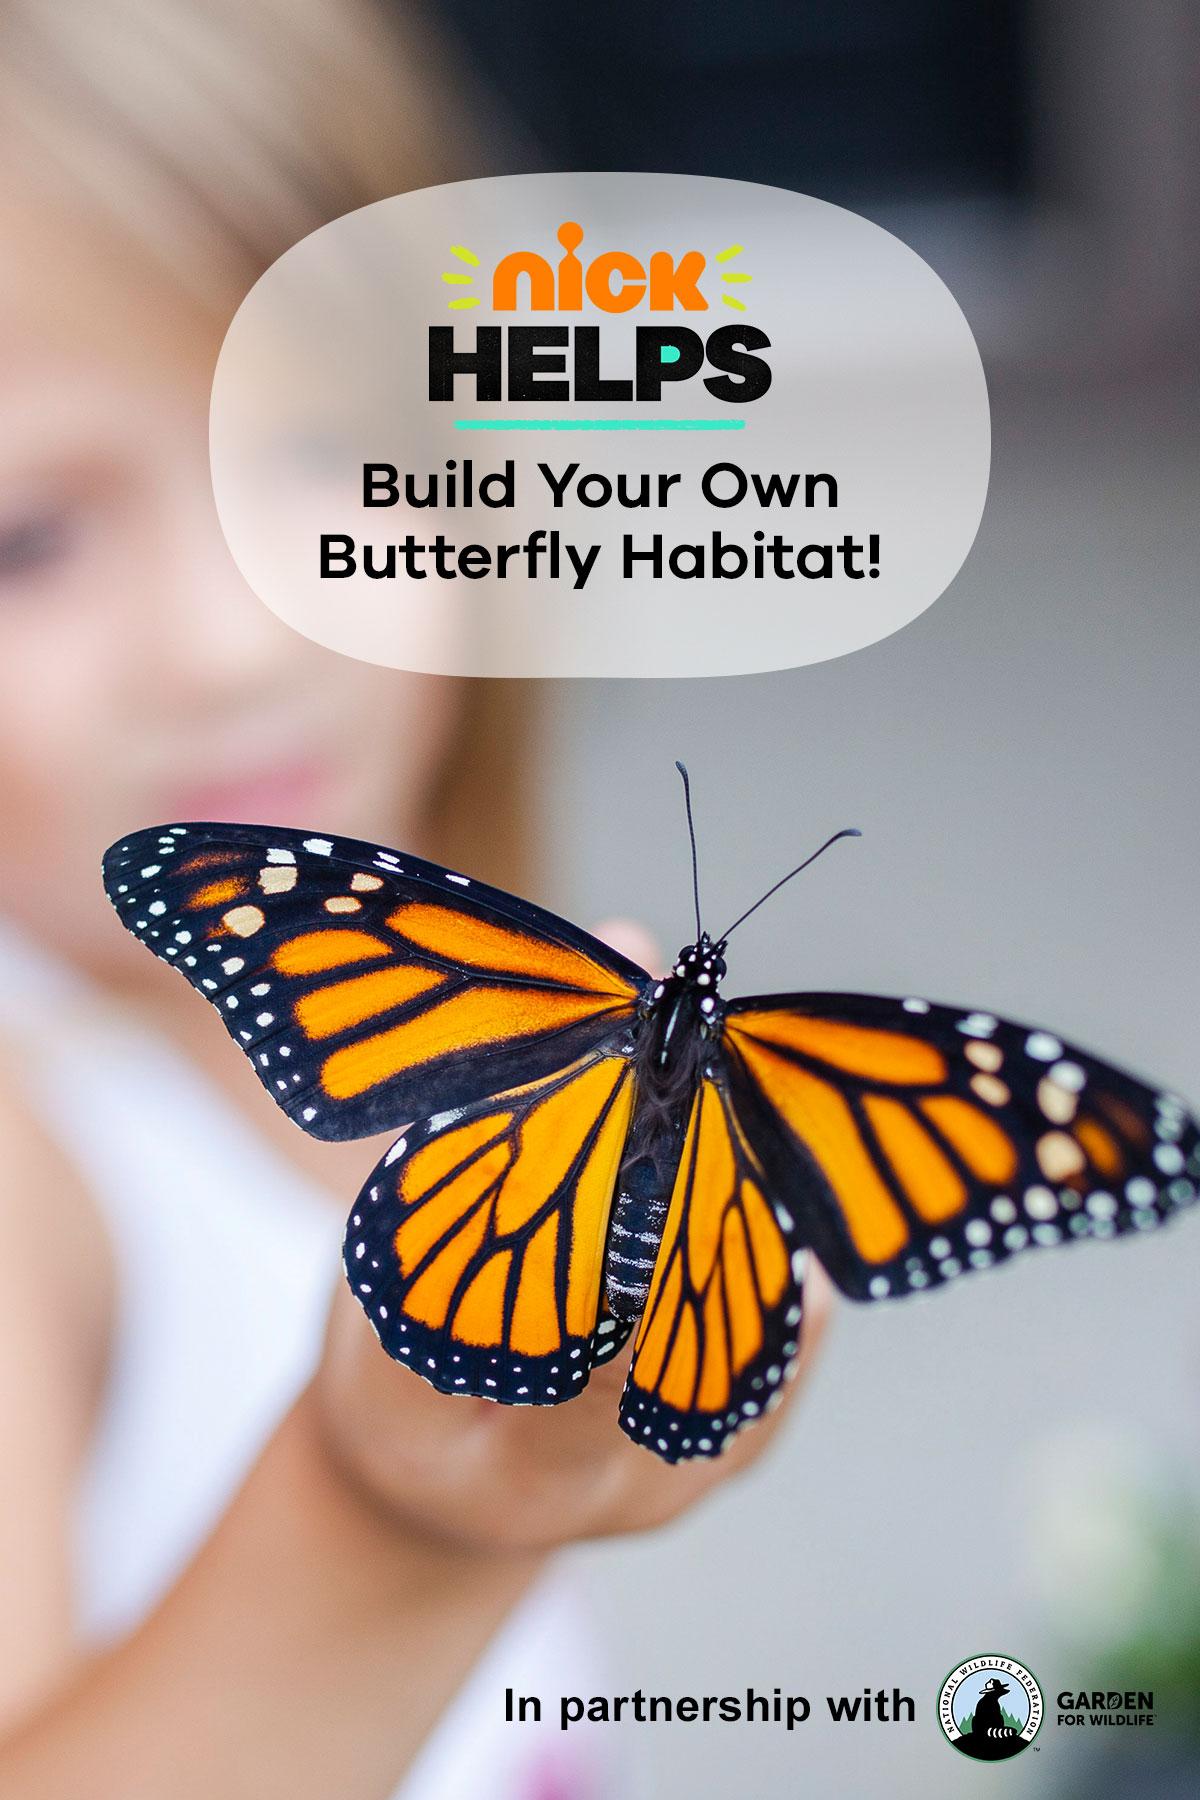 Make a Butterfly Habitat